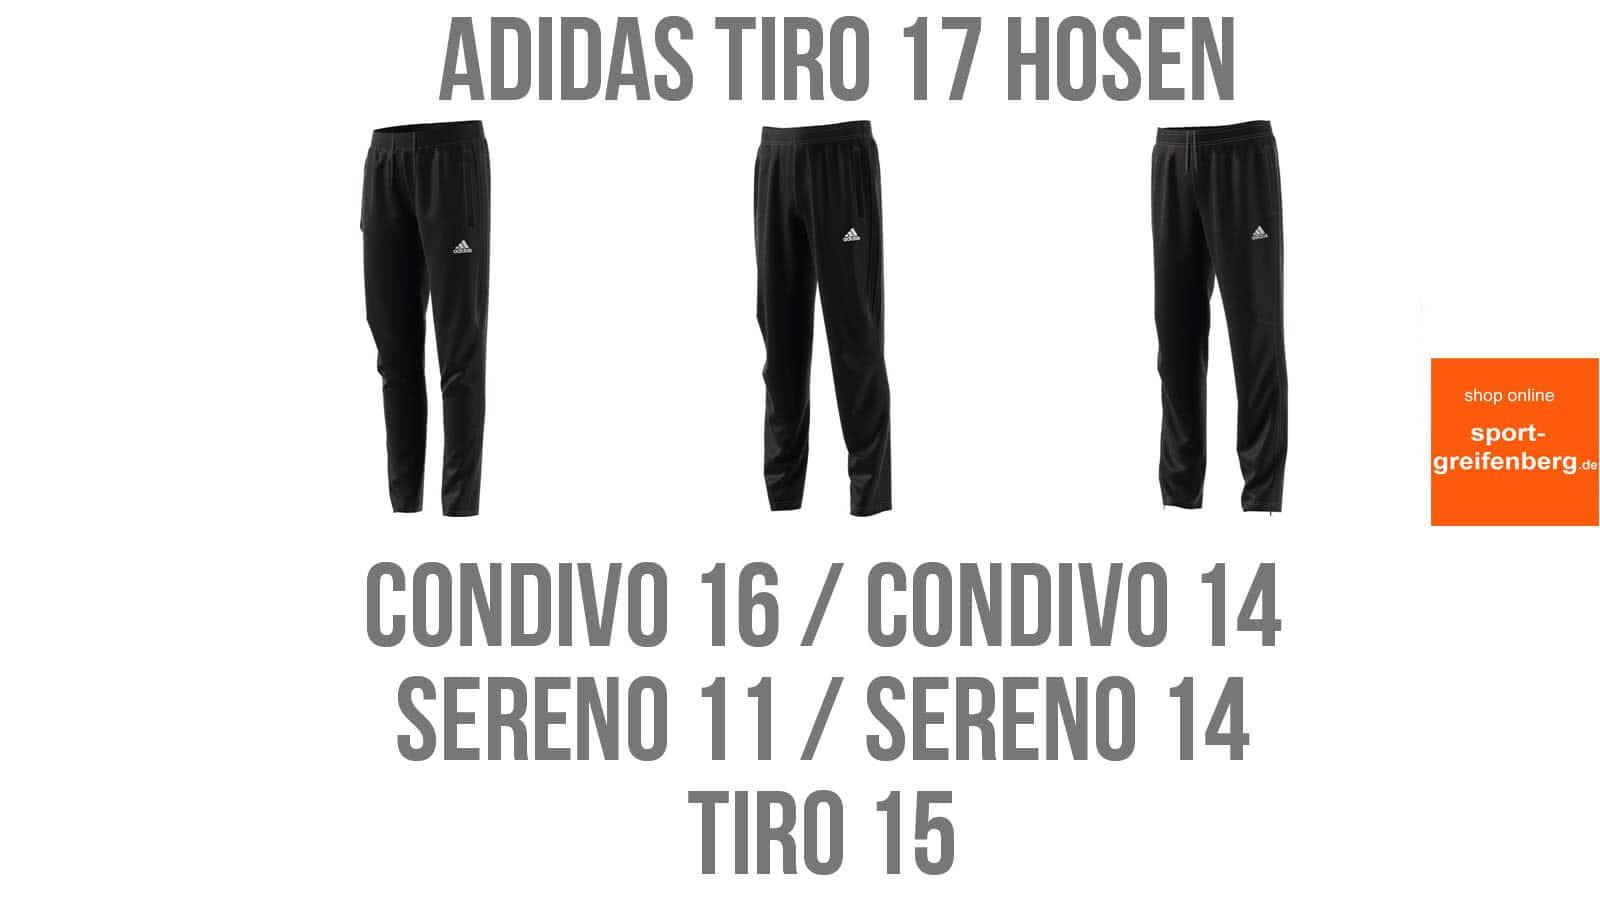 Química Específicamente Pedir prestado  Adidas Tiro 17 Hosen zu anderen Trainingsanzügen ☆